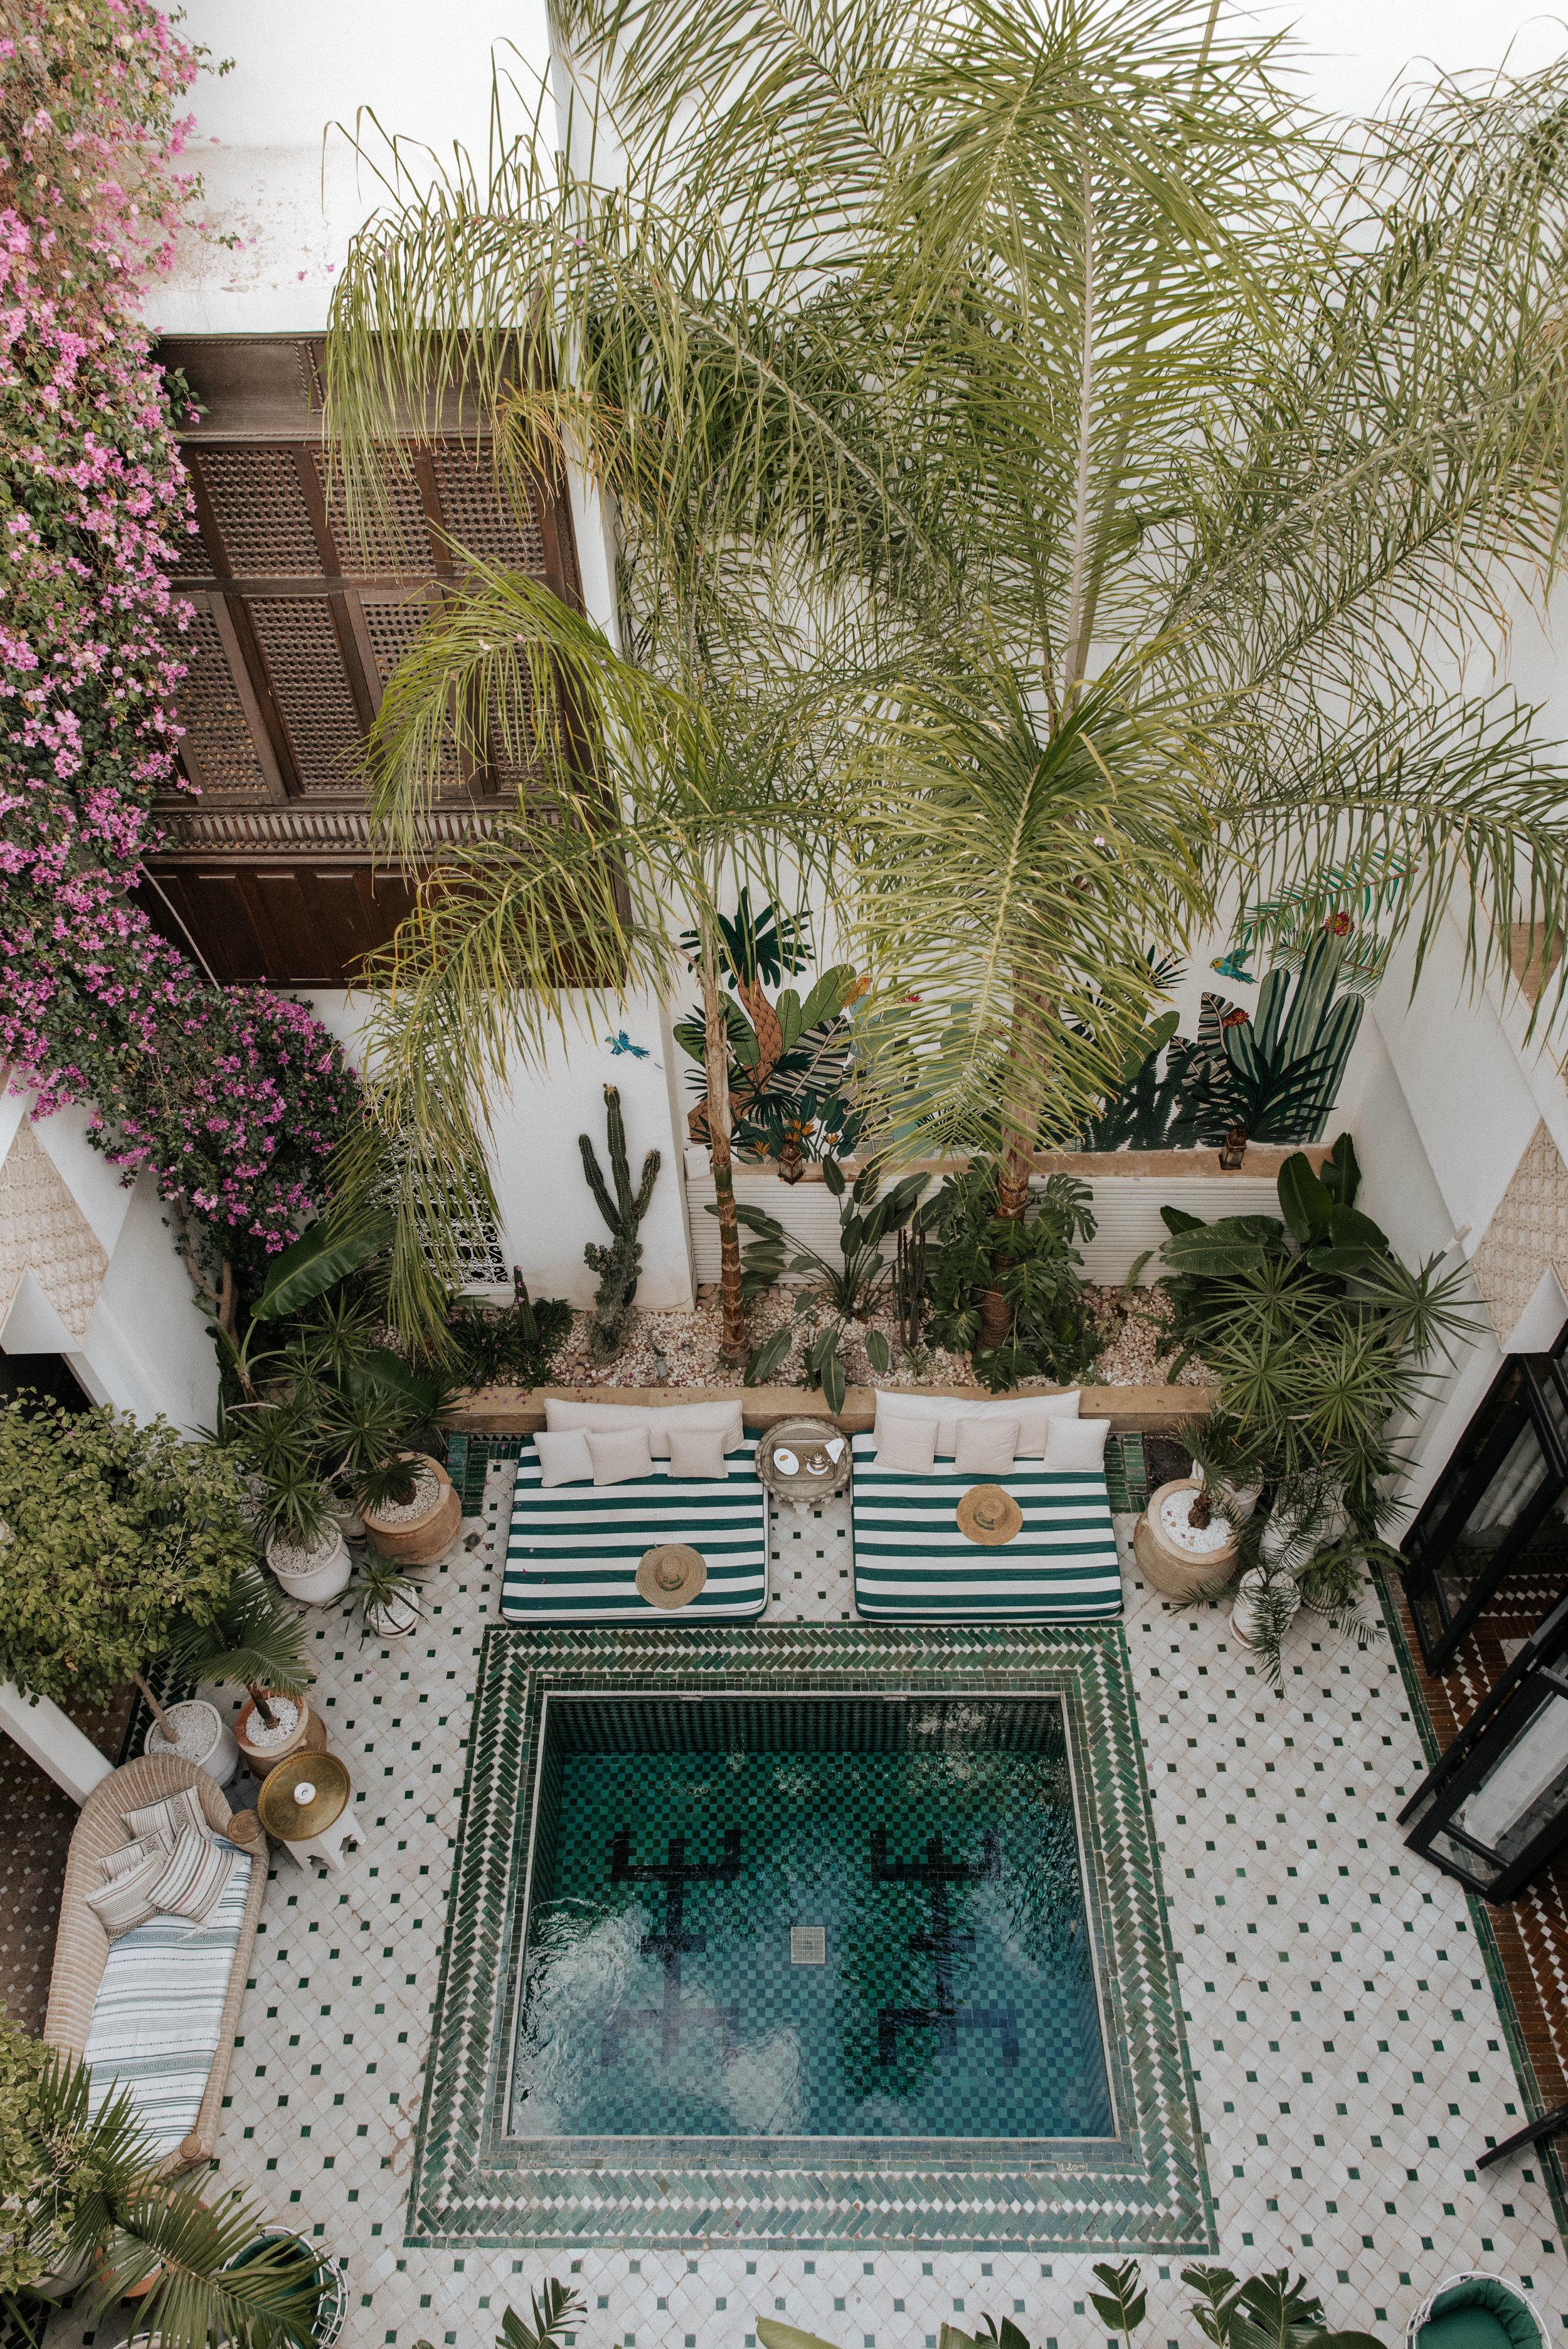 Morocco-453.jpg